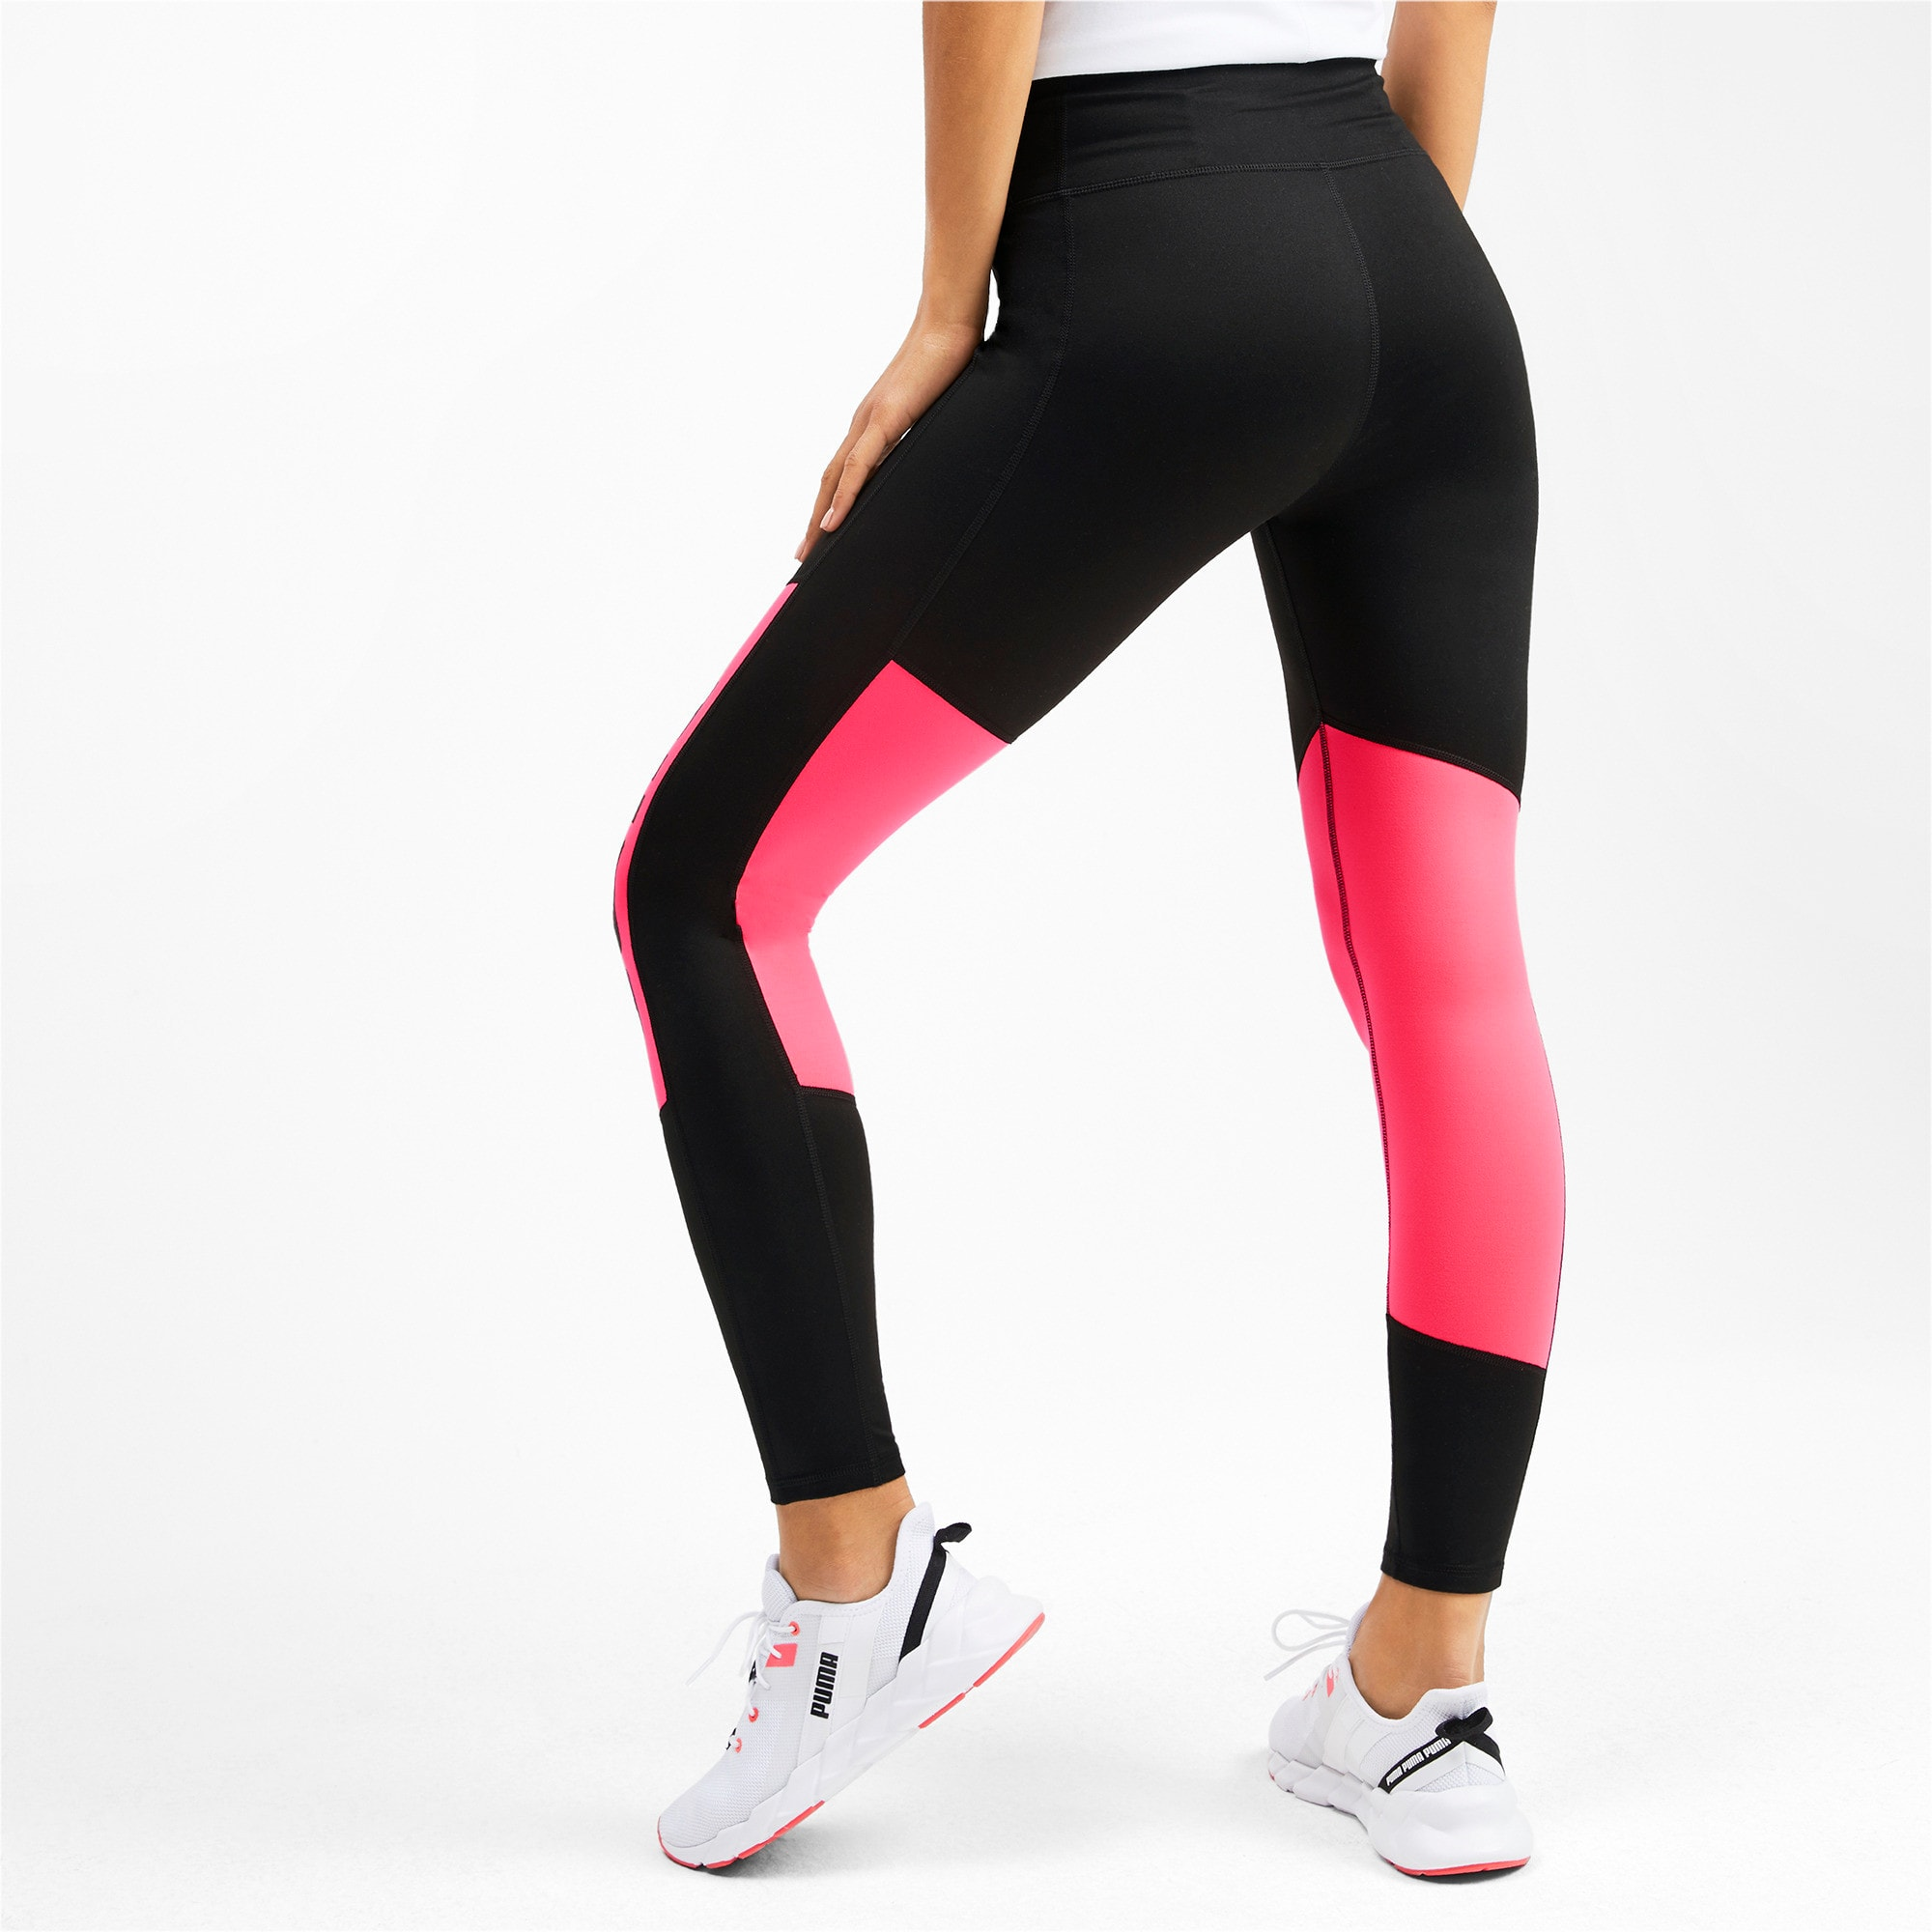 Thumbnail 2 of Logo 7/8 Graphic Women's Training Leggings, Puma Black-Pink Alert, medium-IND